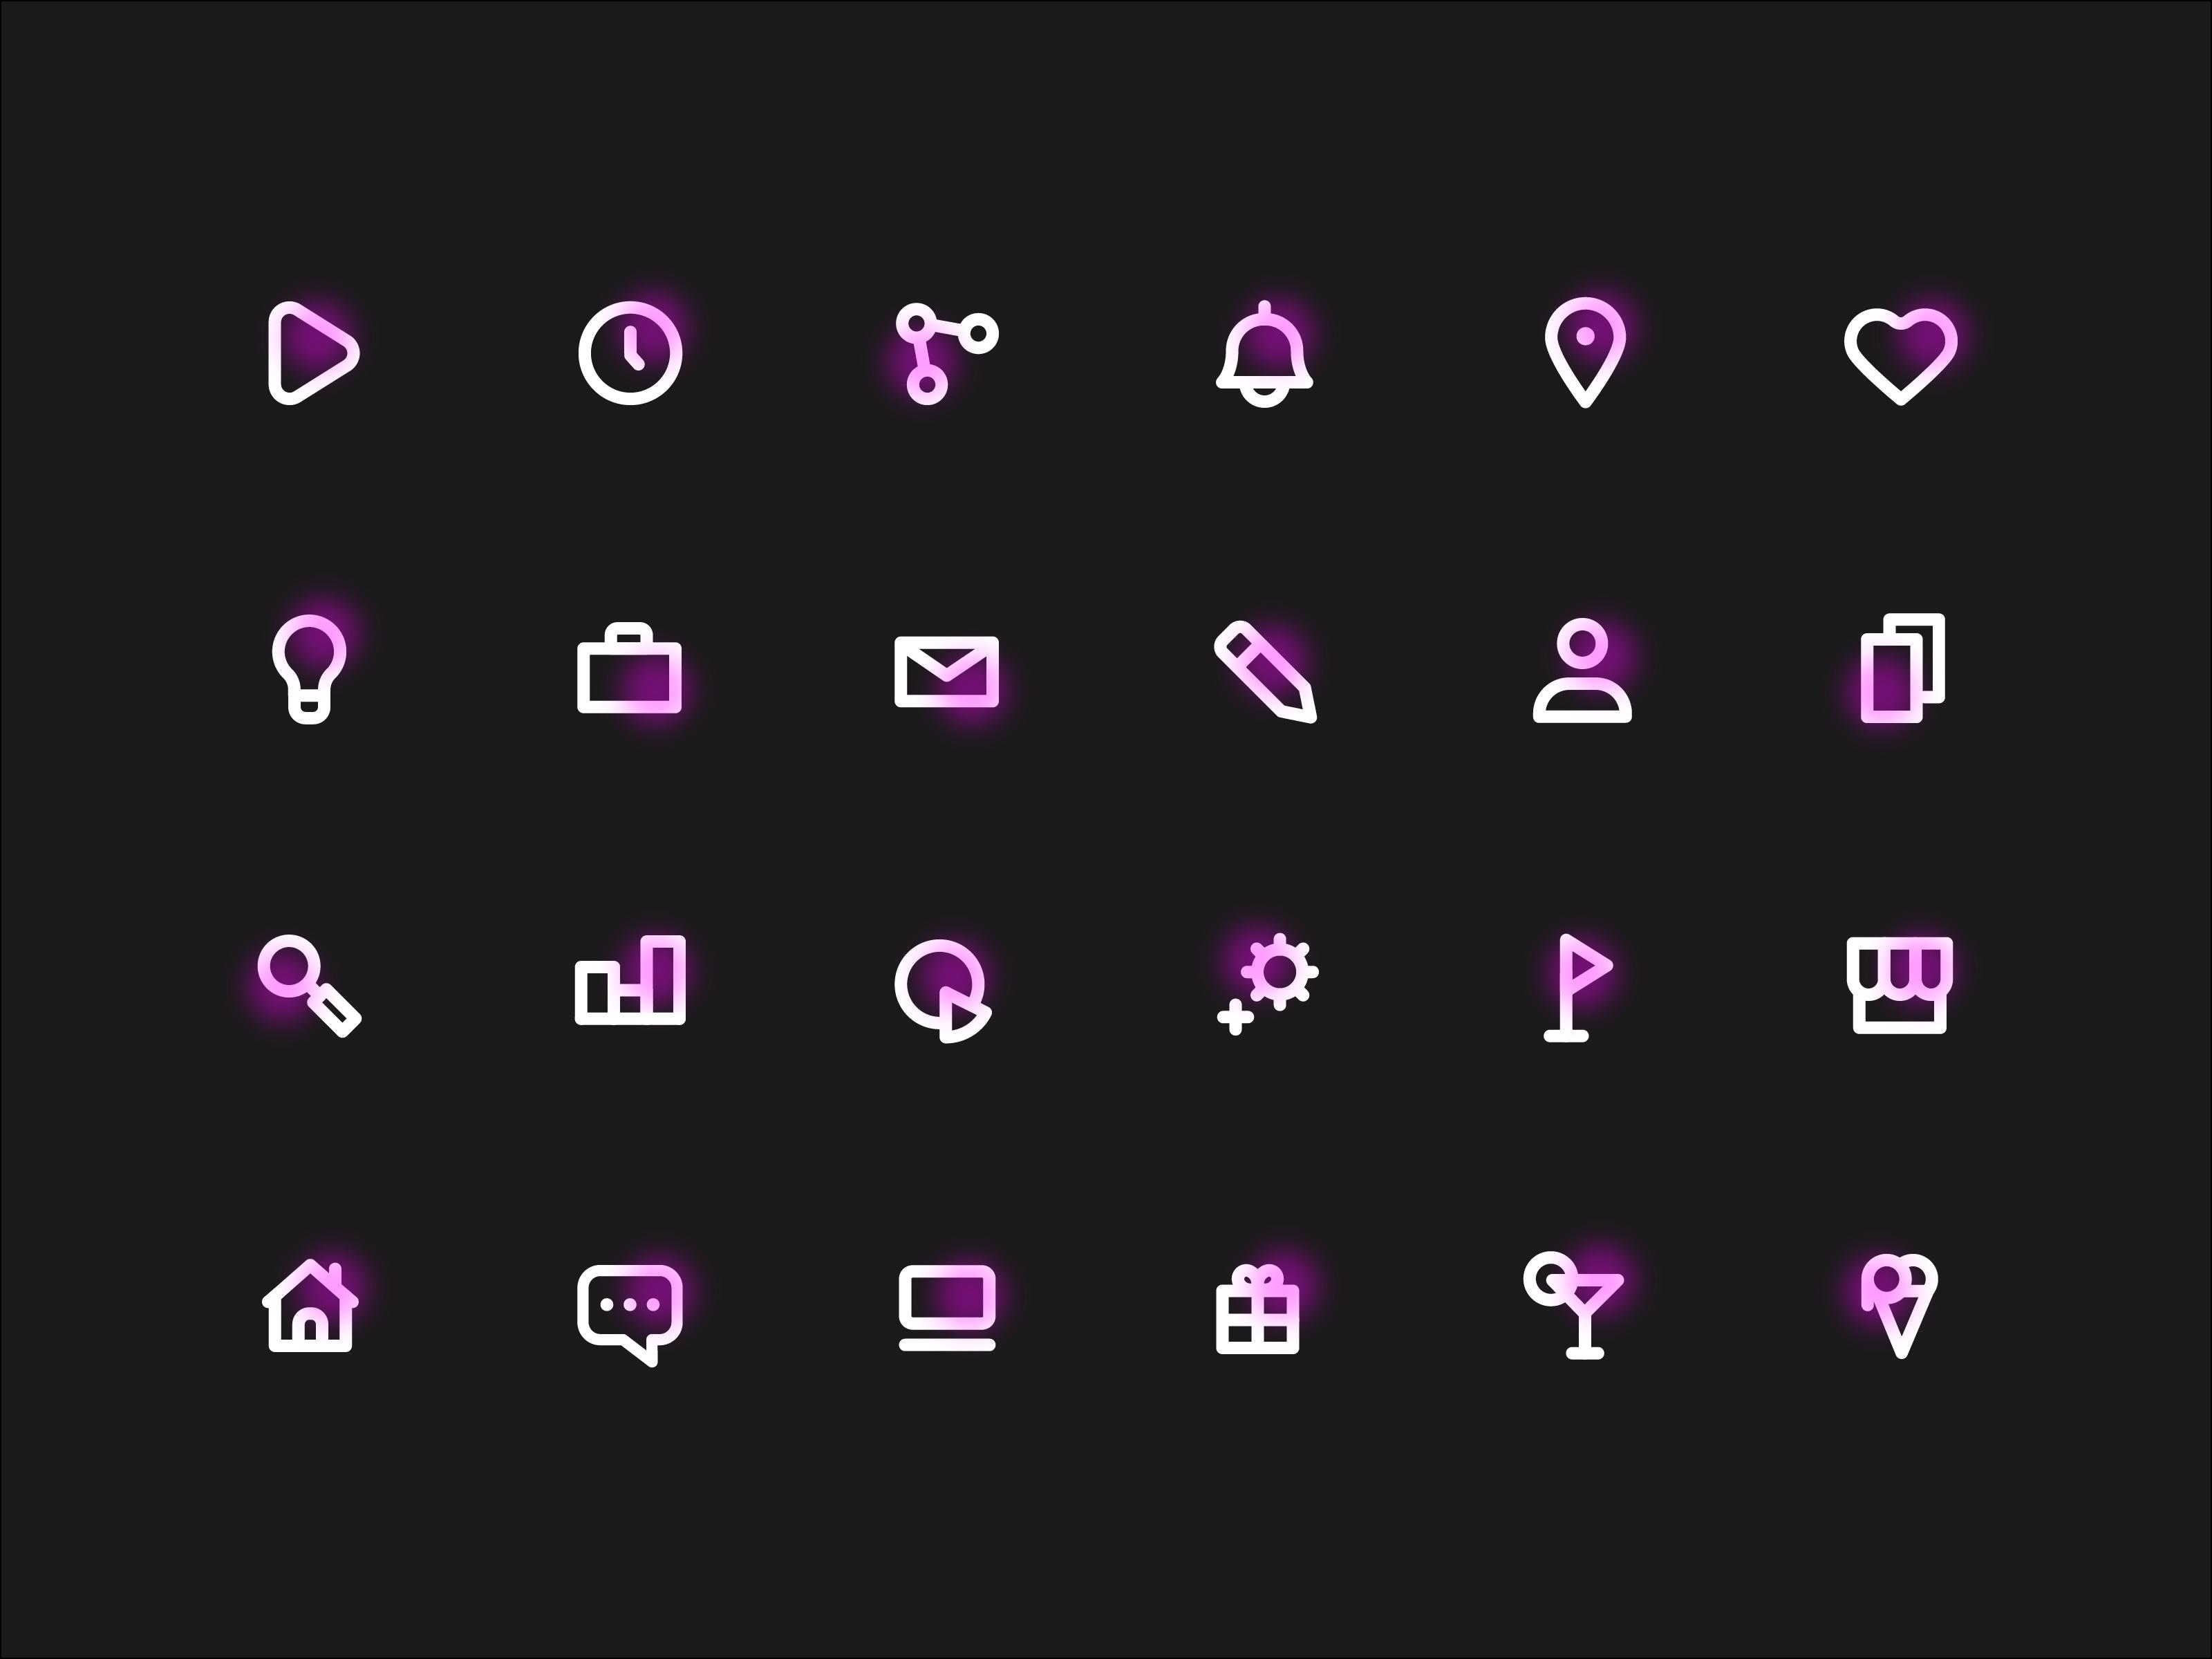 Neon Icons Freebie Графический дизайн, Пиктограмма, Проекты